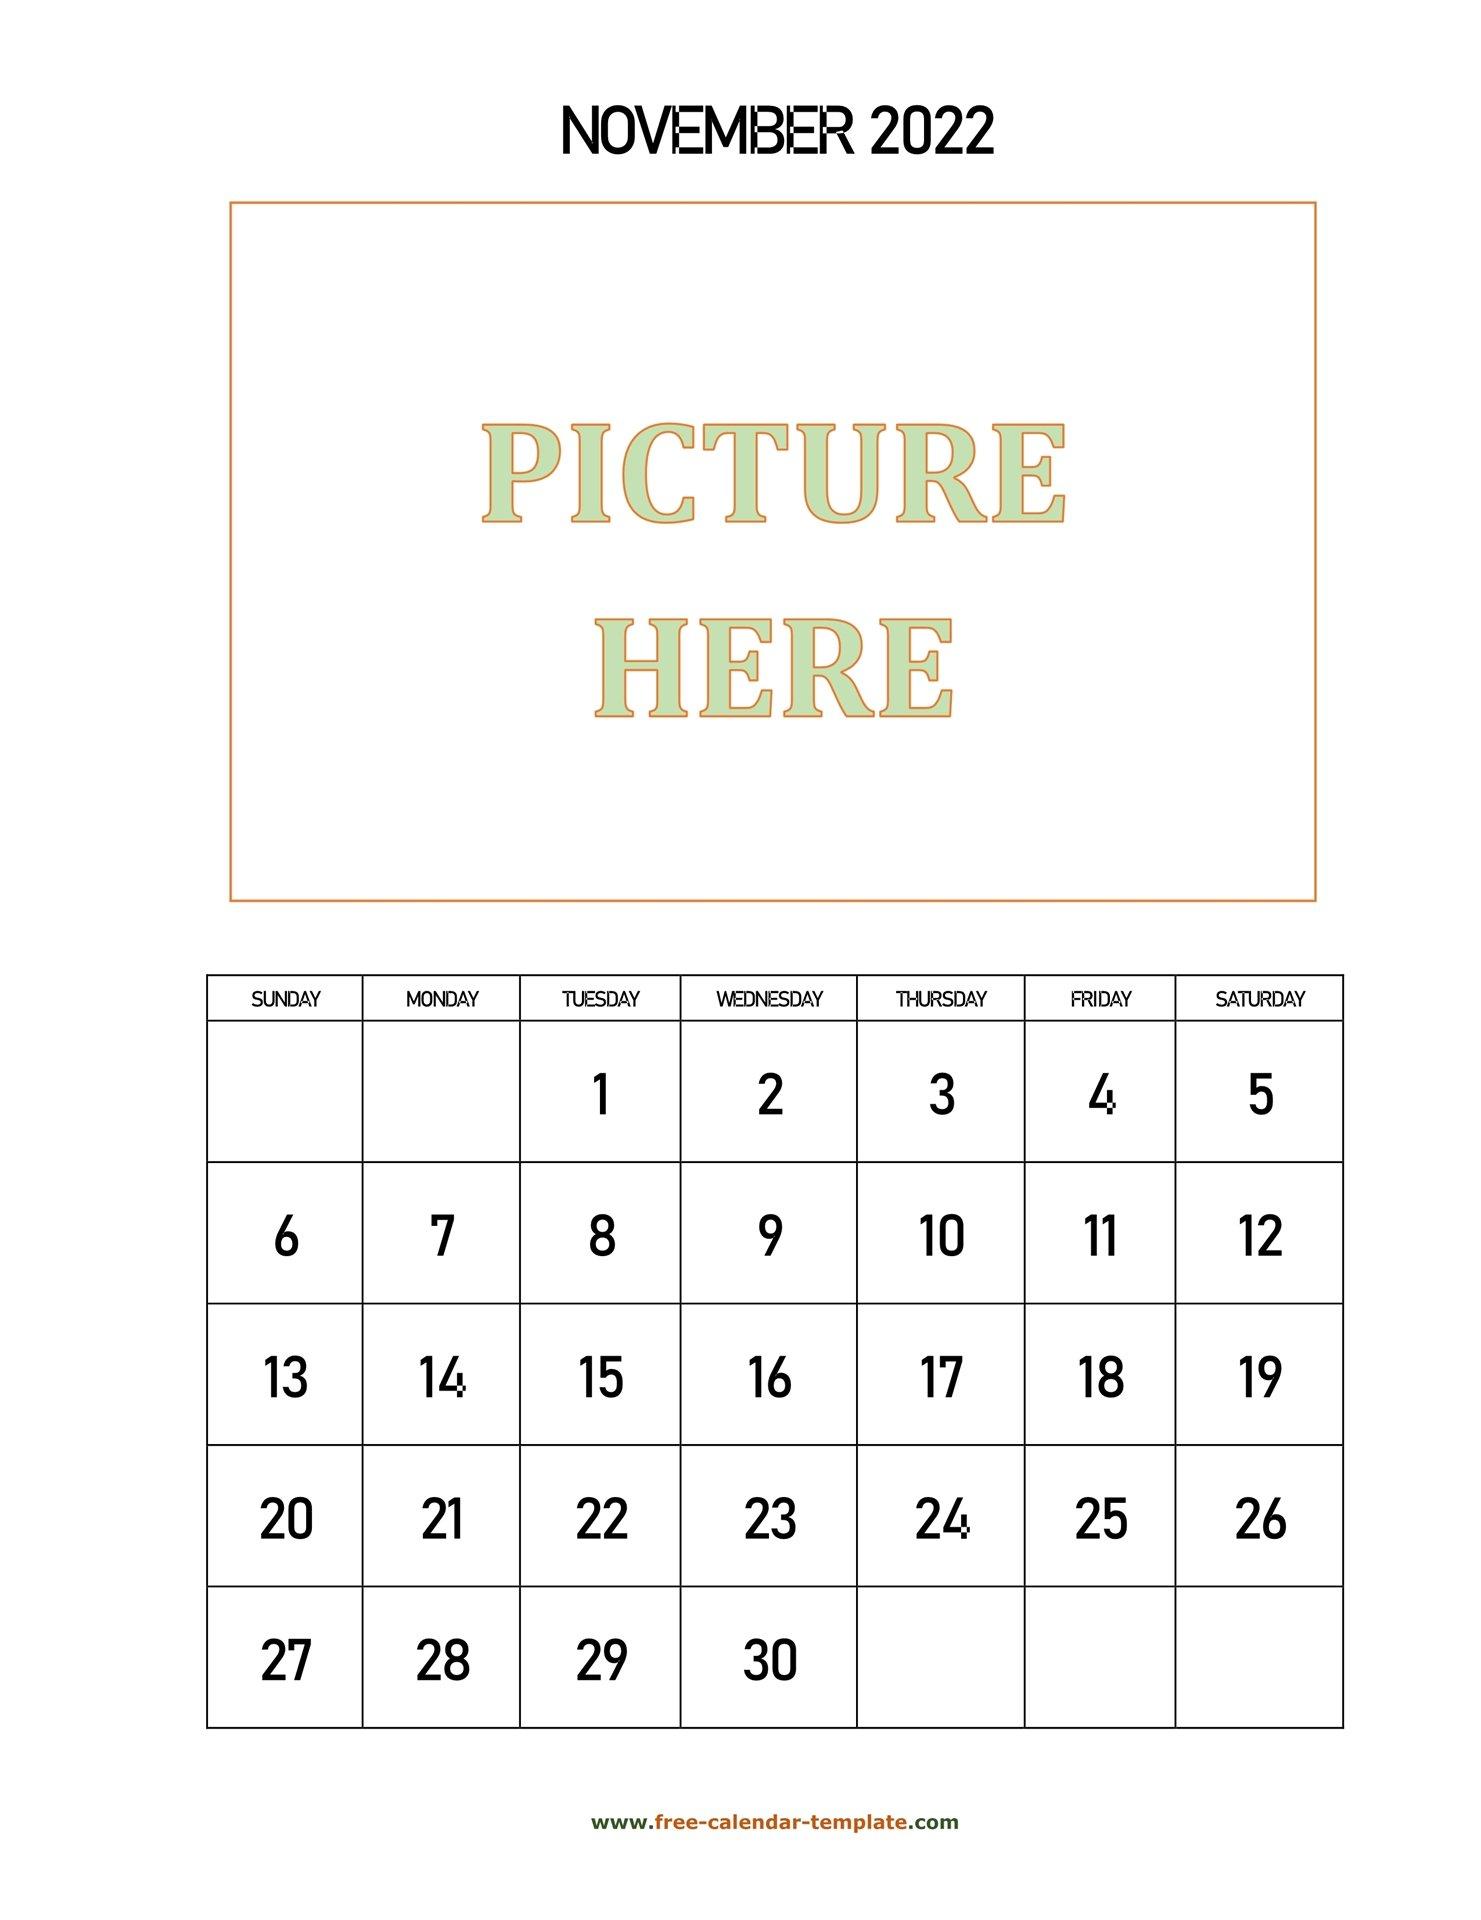 November Printable 2022 Calendar, Space For Add Picture inside November 2022 Calendar Planner Printable